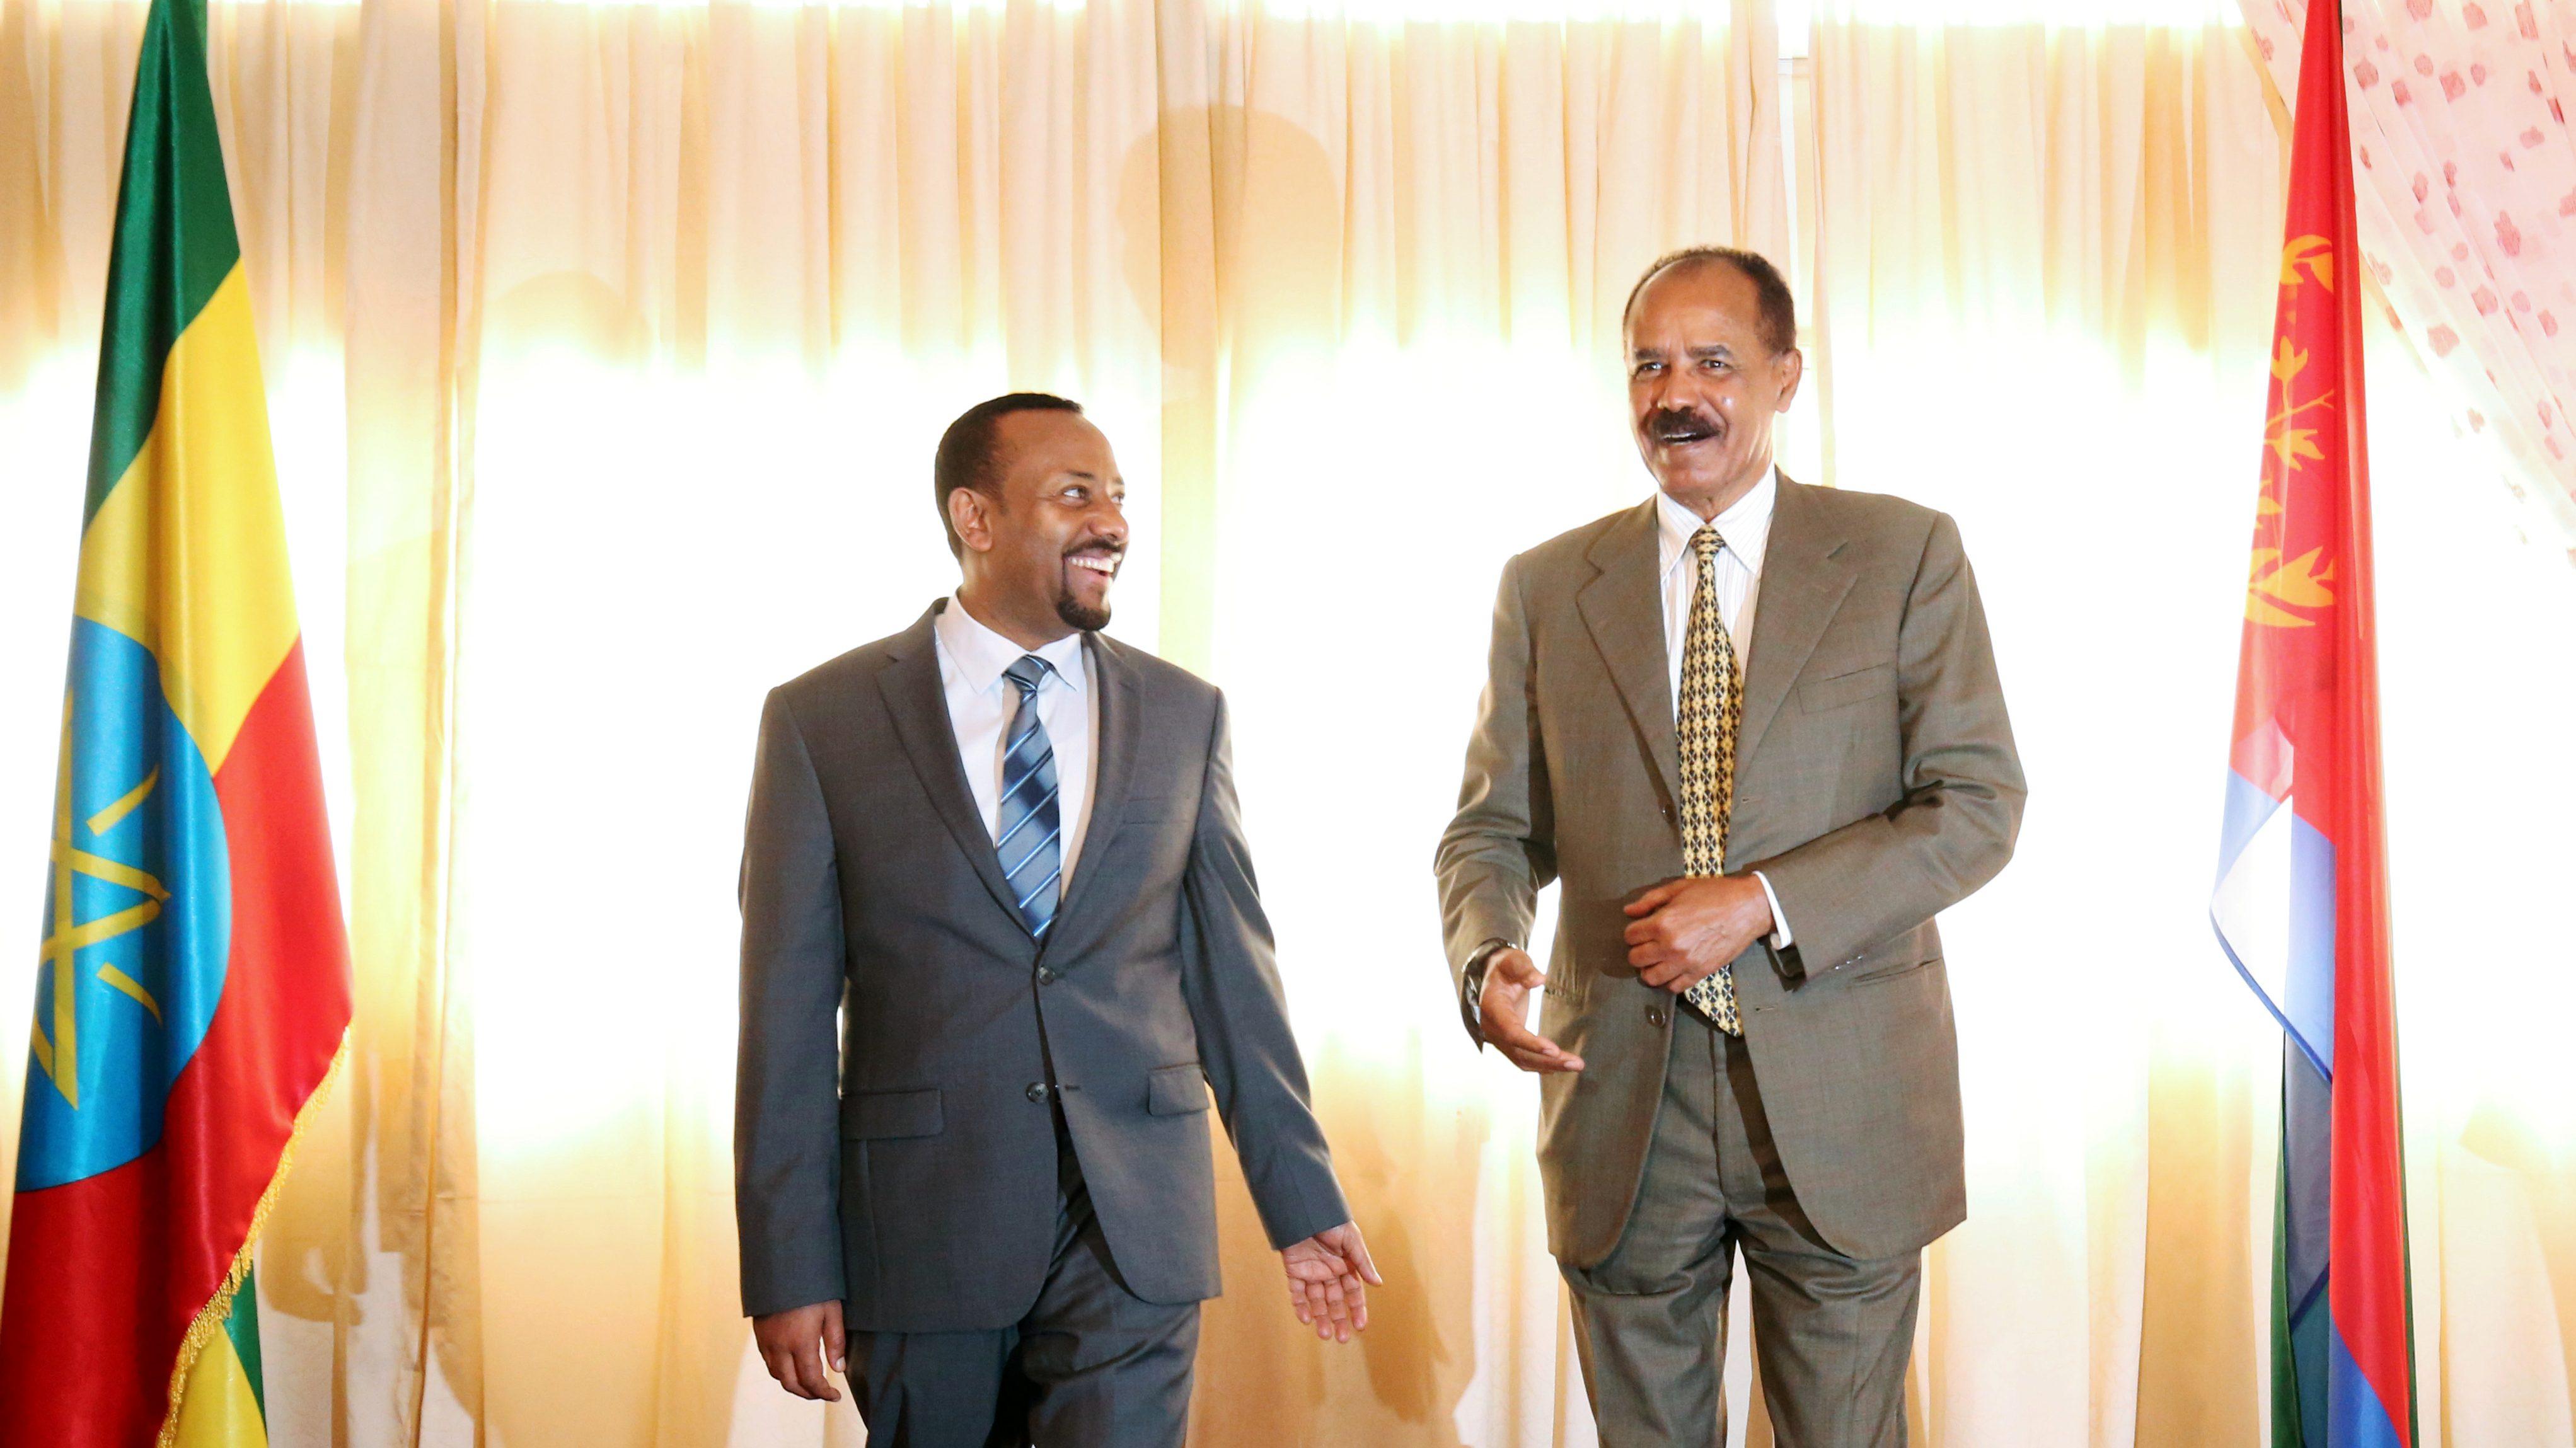 The Ethiopia-Eritrea Abiy Isaias peace accord glow is fading